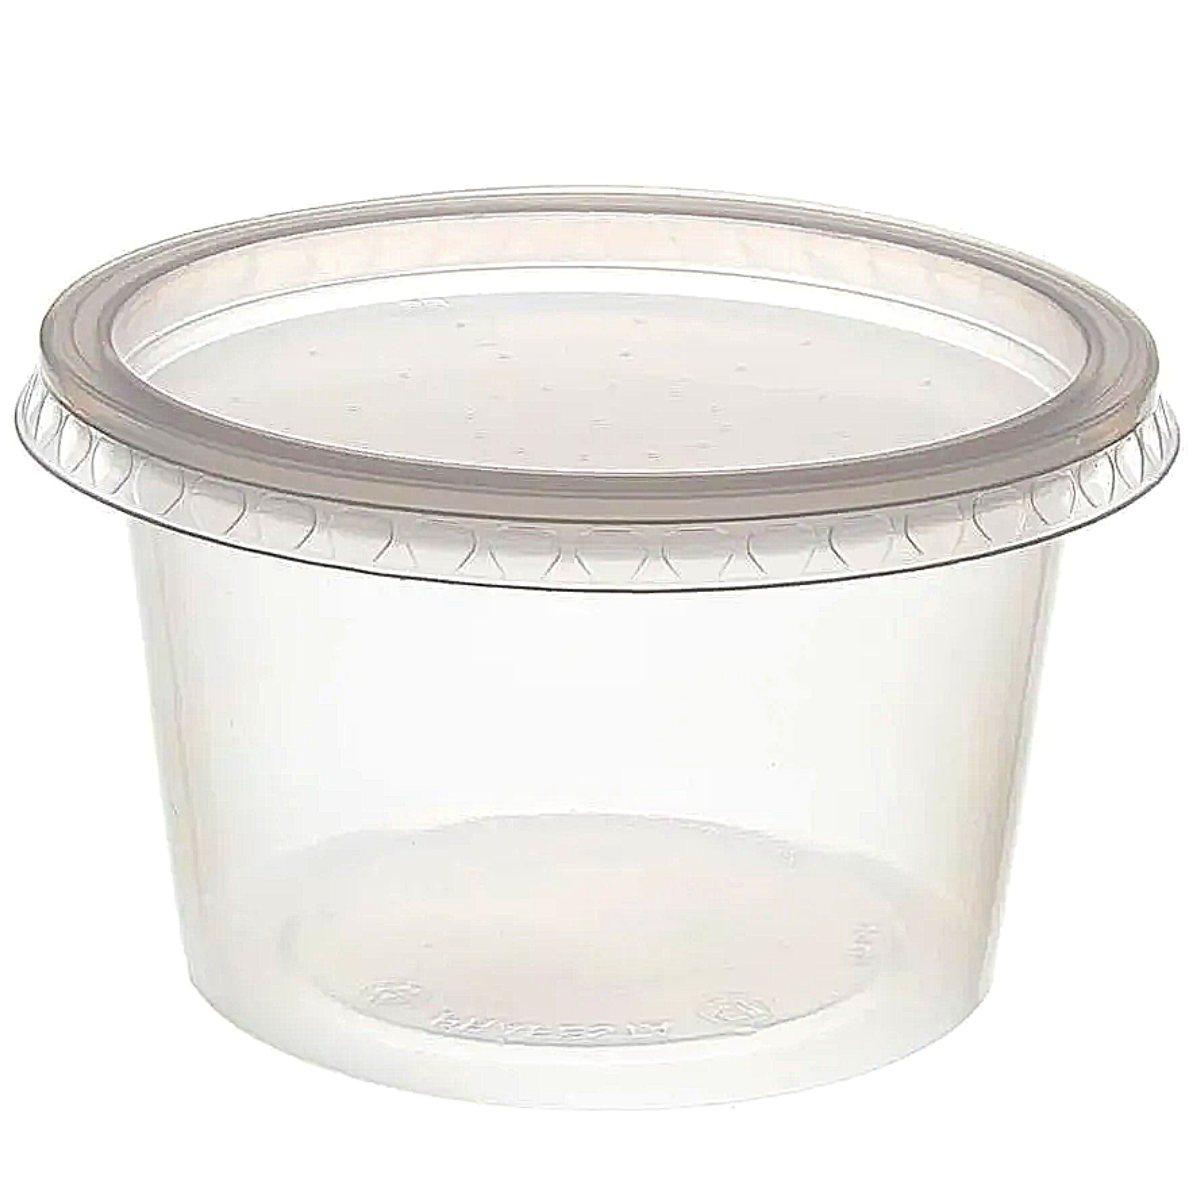 Pote com Sobretampa Rioplastic 250ml Kit com 75 unidades